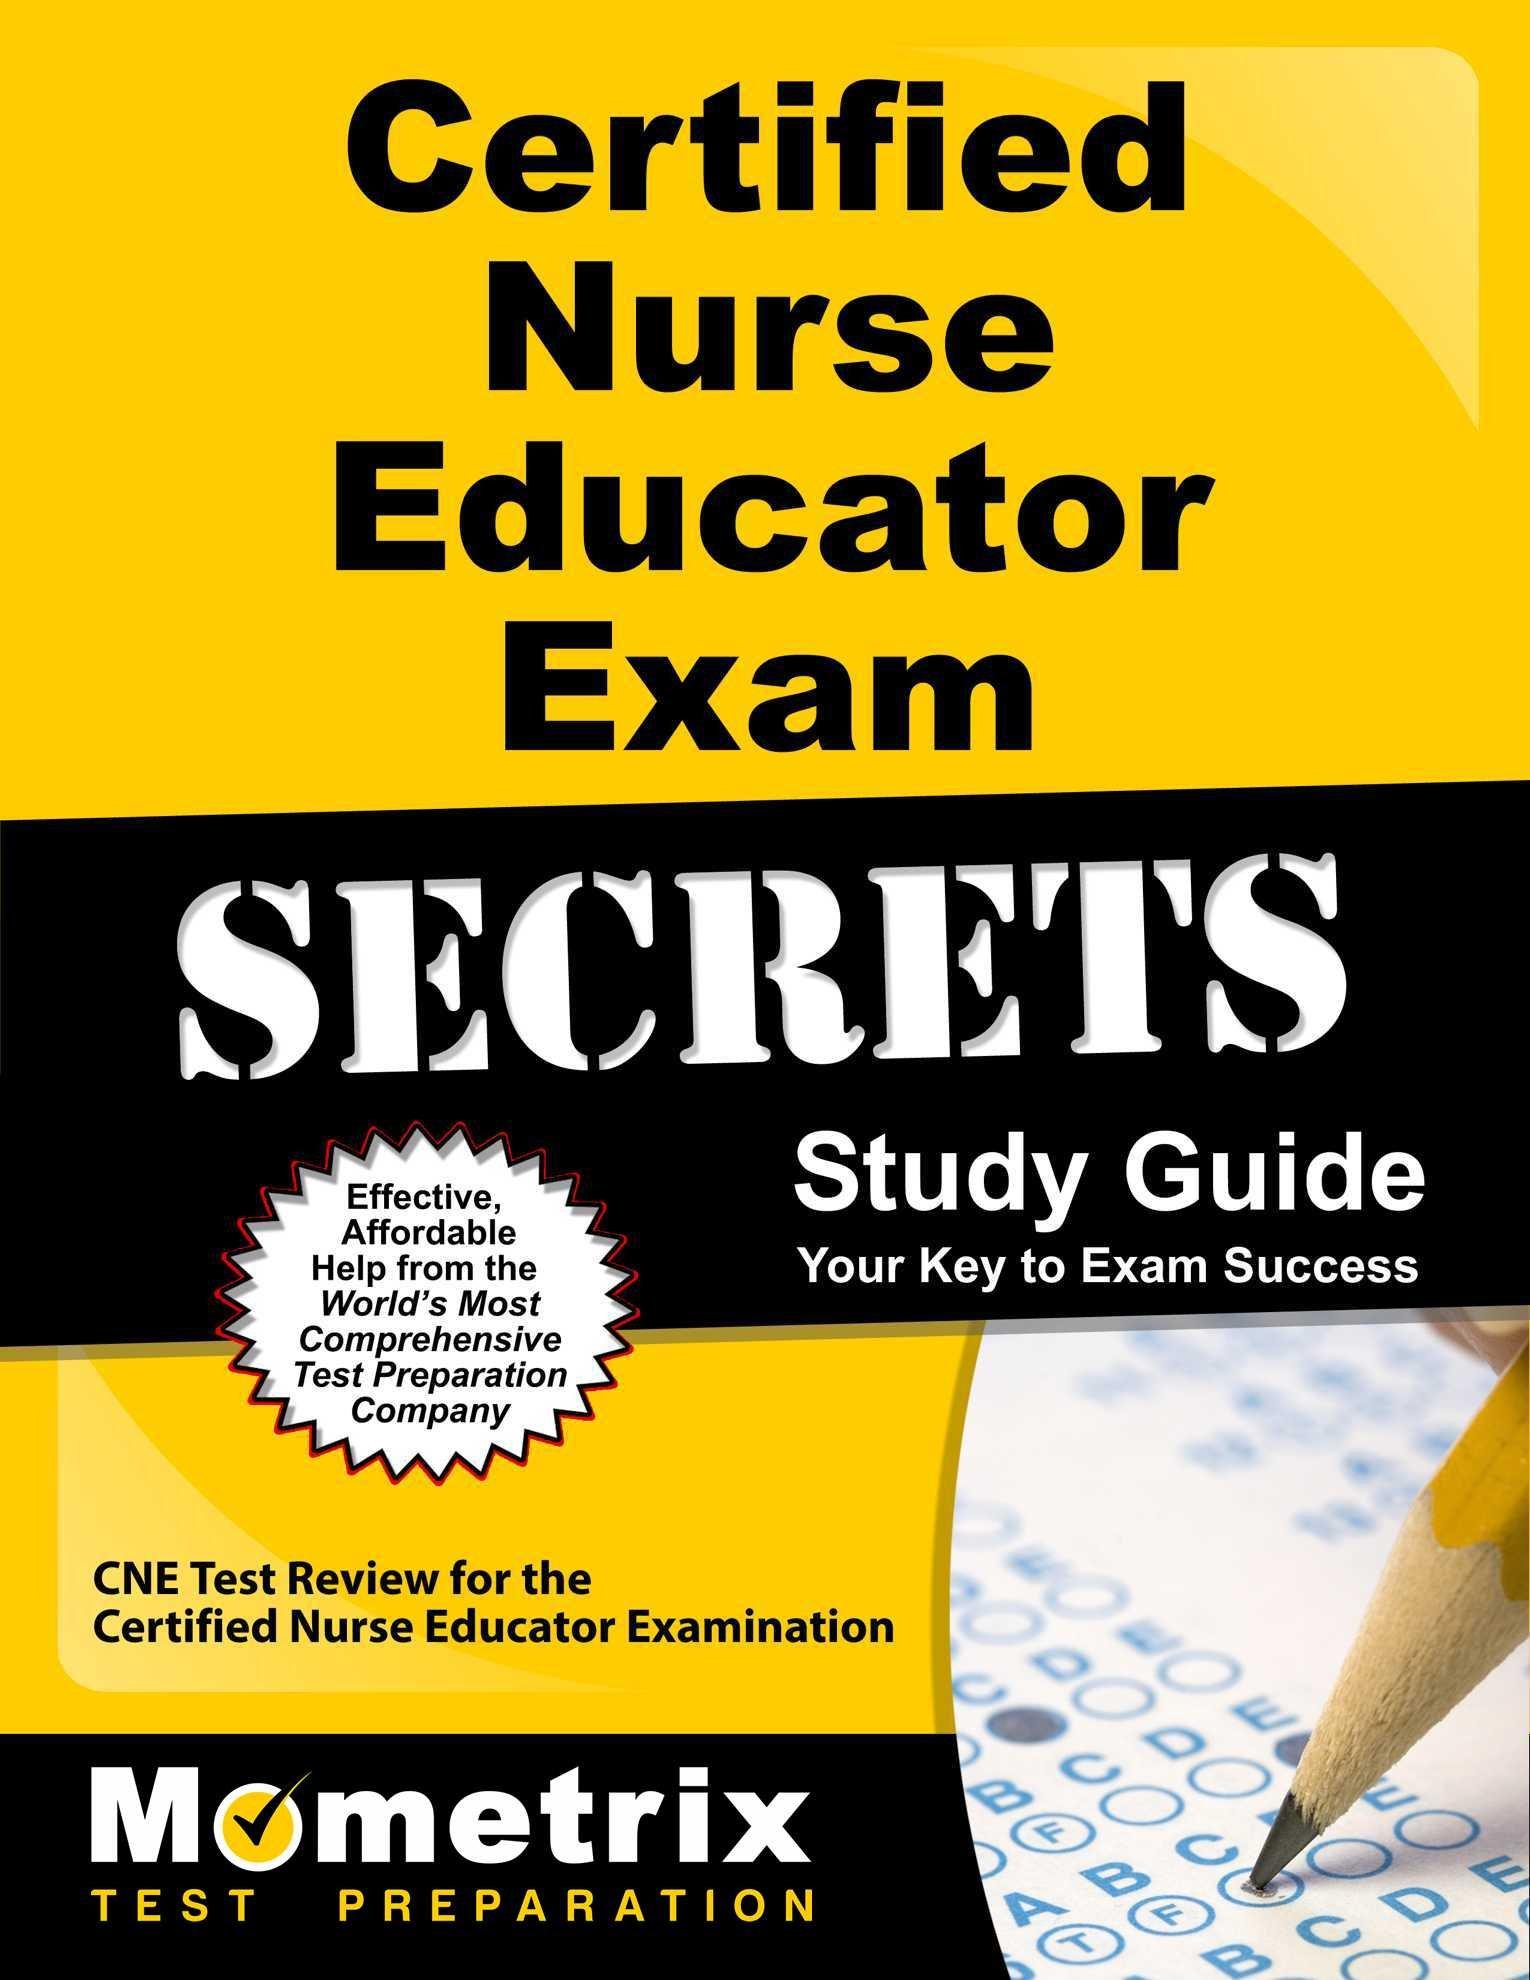 Buy Certified Nurse Educator Exam Secrets Cne Test Review For The